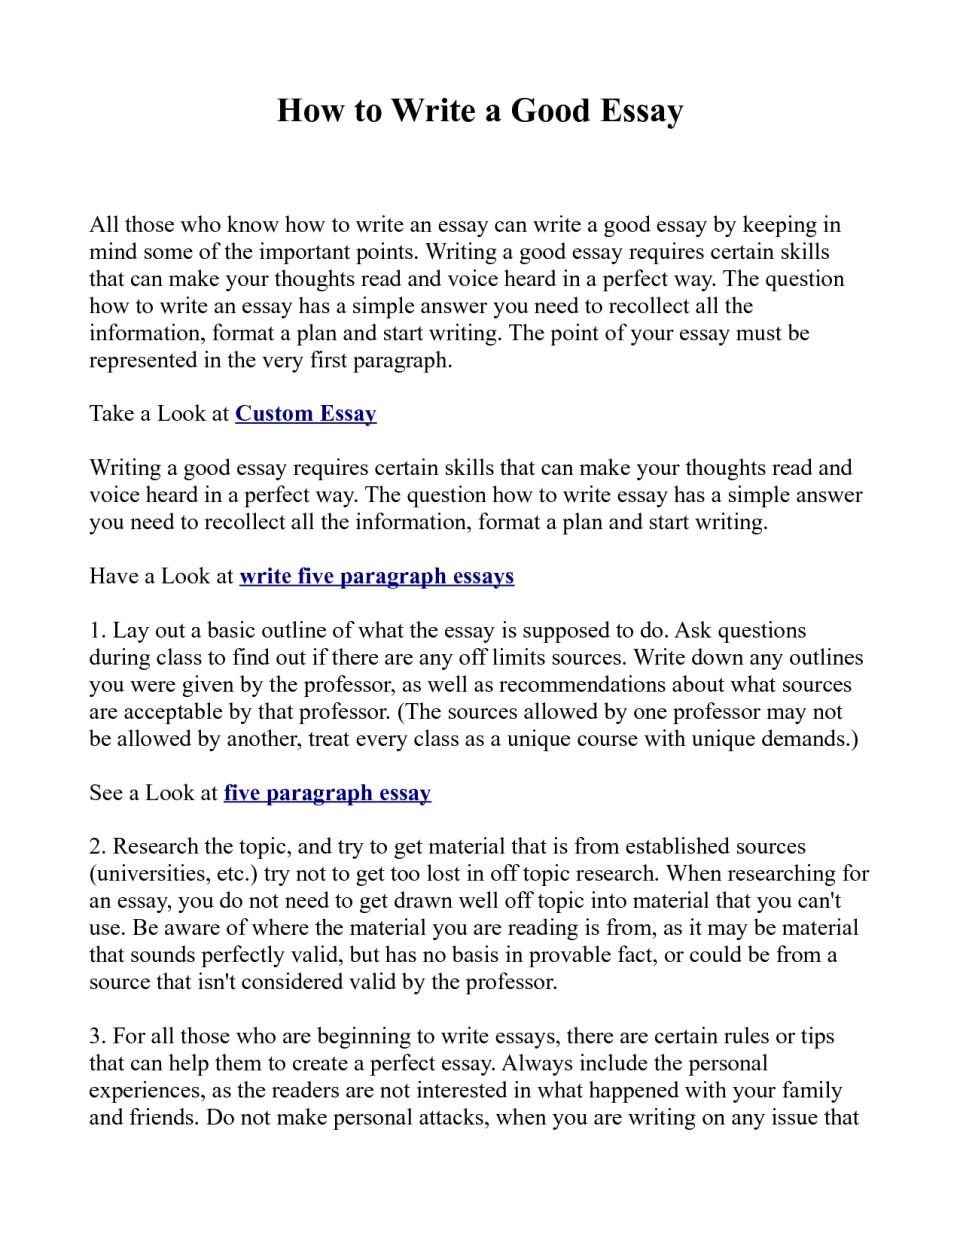 Defining oneself essay